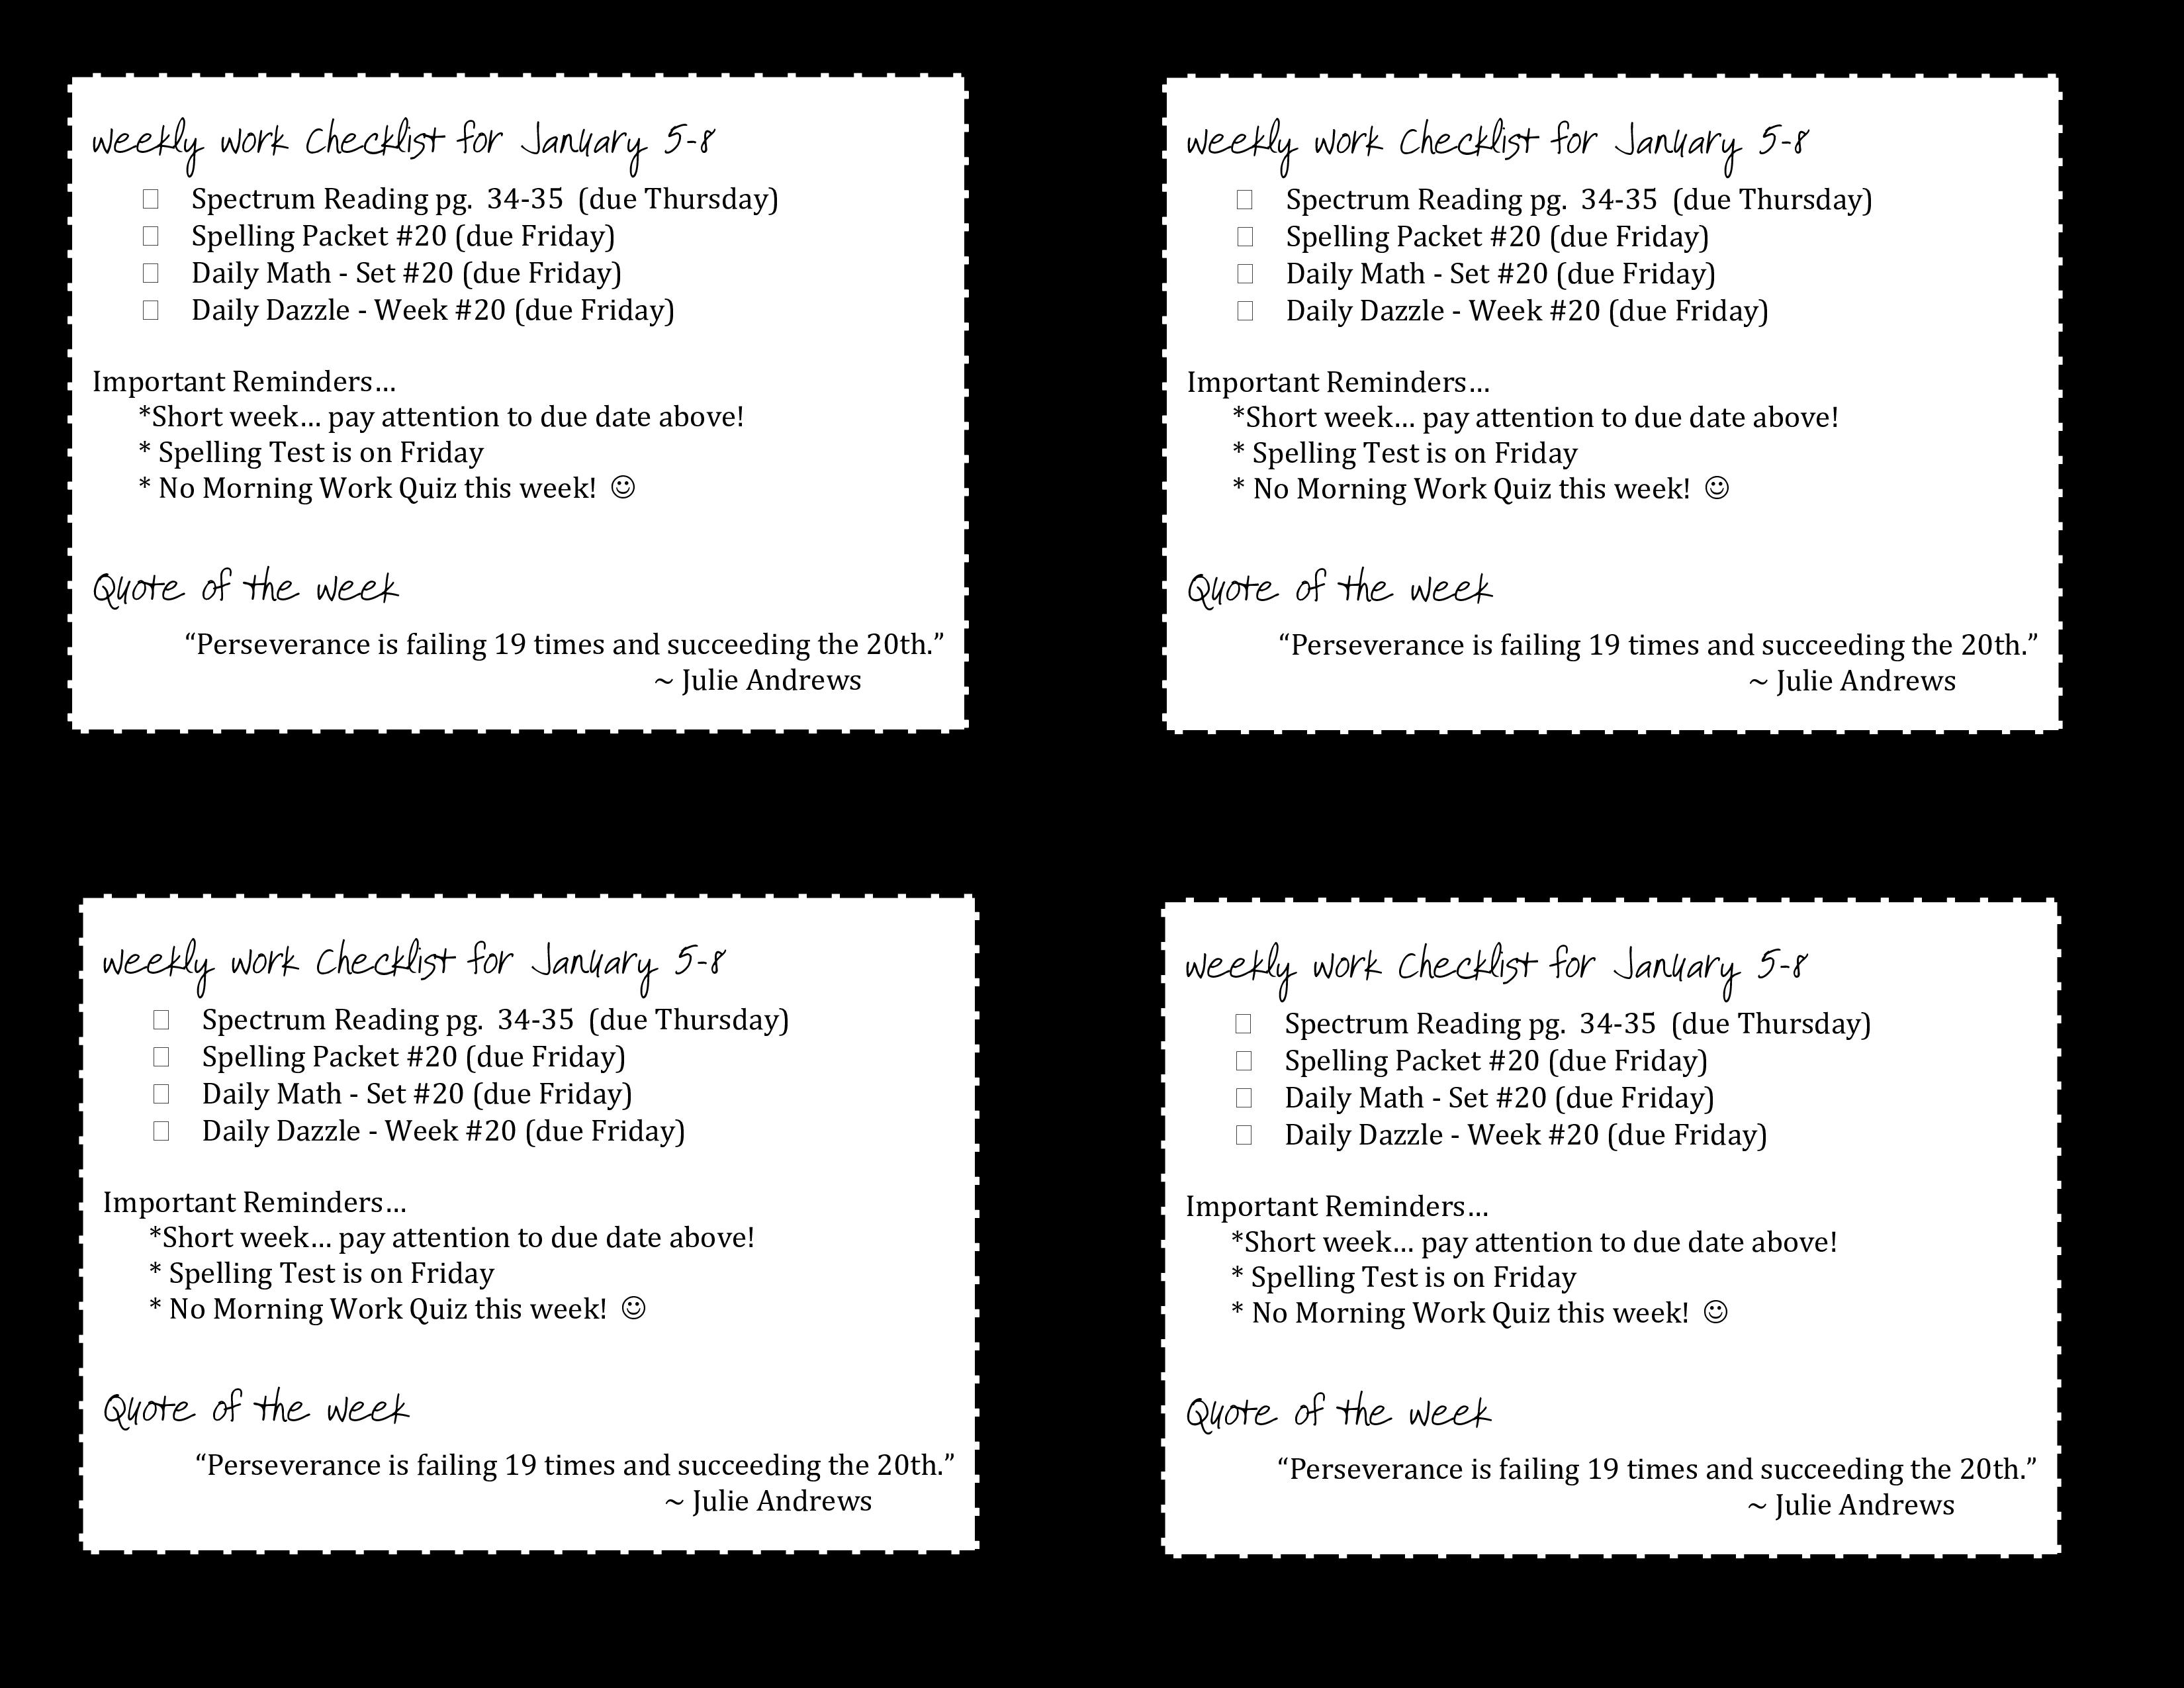 Free weekly work checklist templates at allbusinesstemplates weekly work checklist main image download template maxwellsz